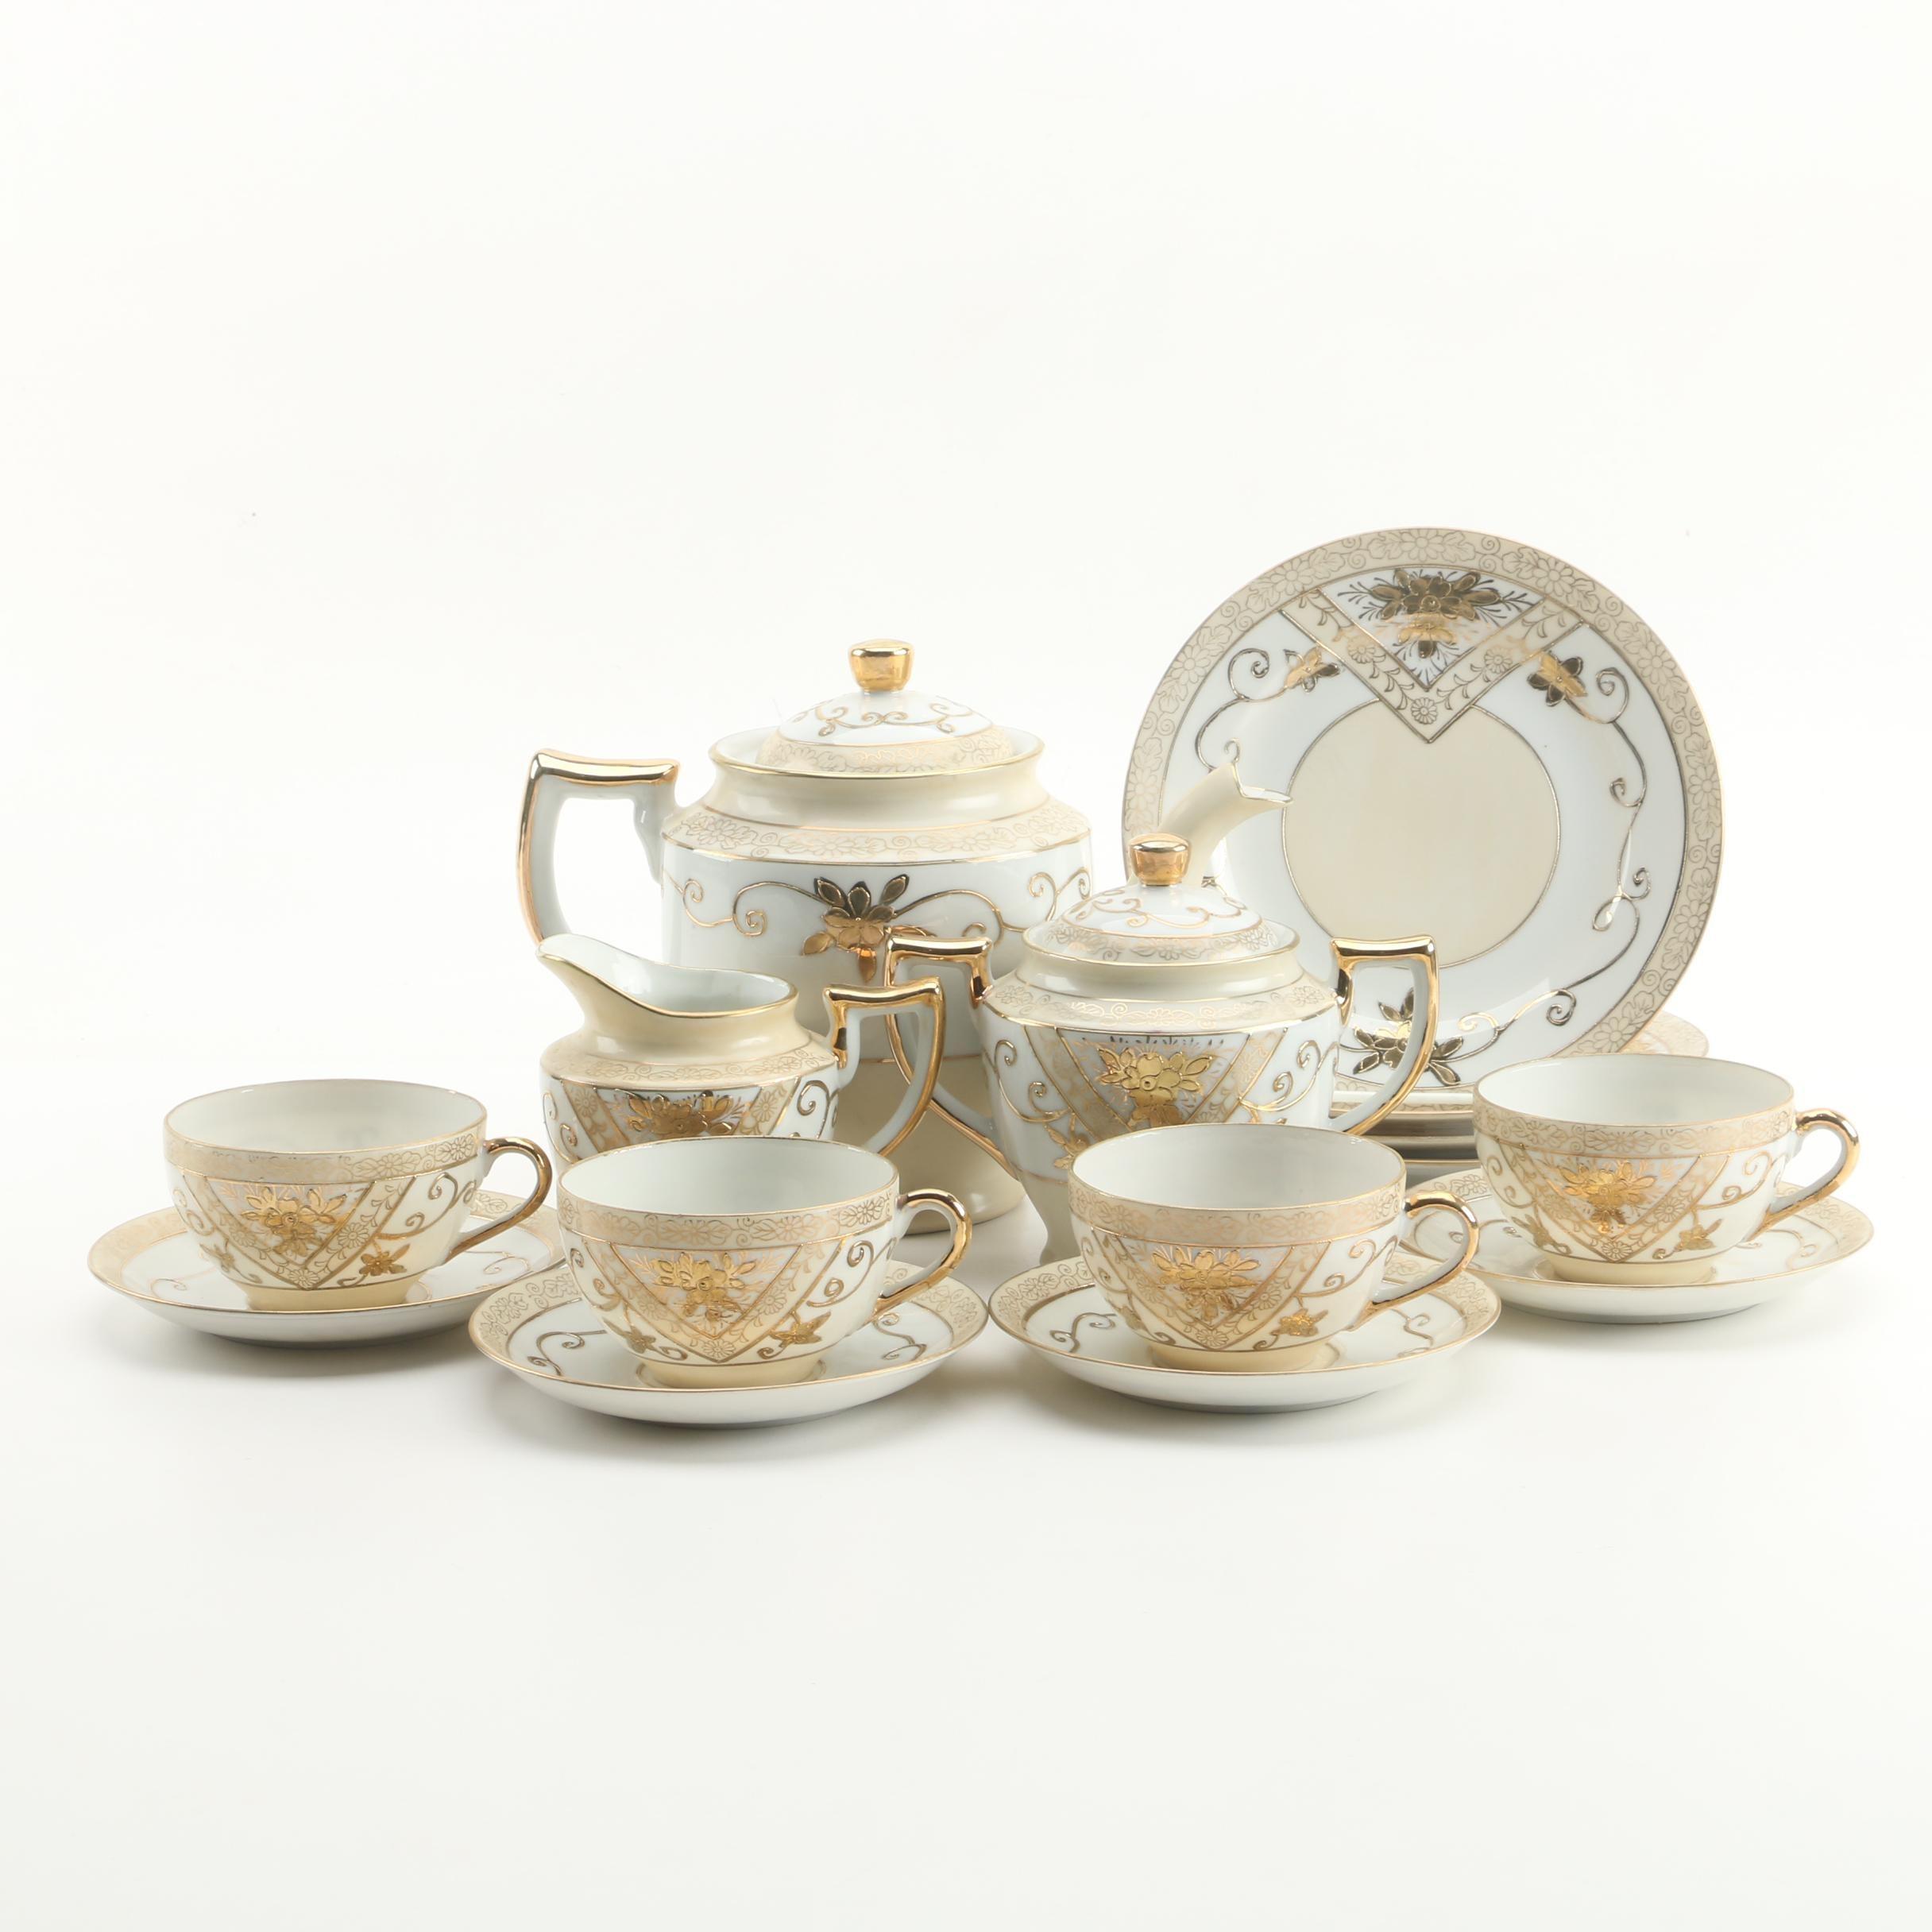 Moriyama Mori-machi Japanese Hand-Painted Gilt Porcelain Tea Set